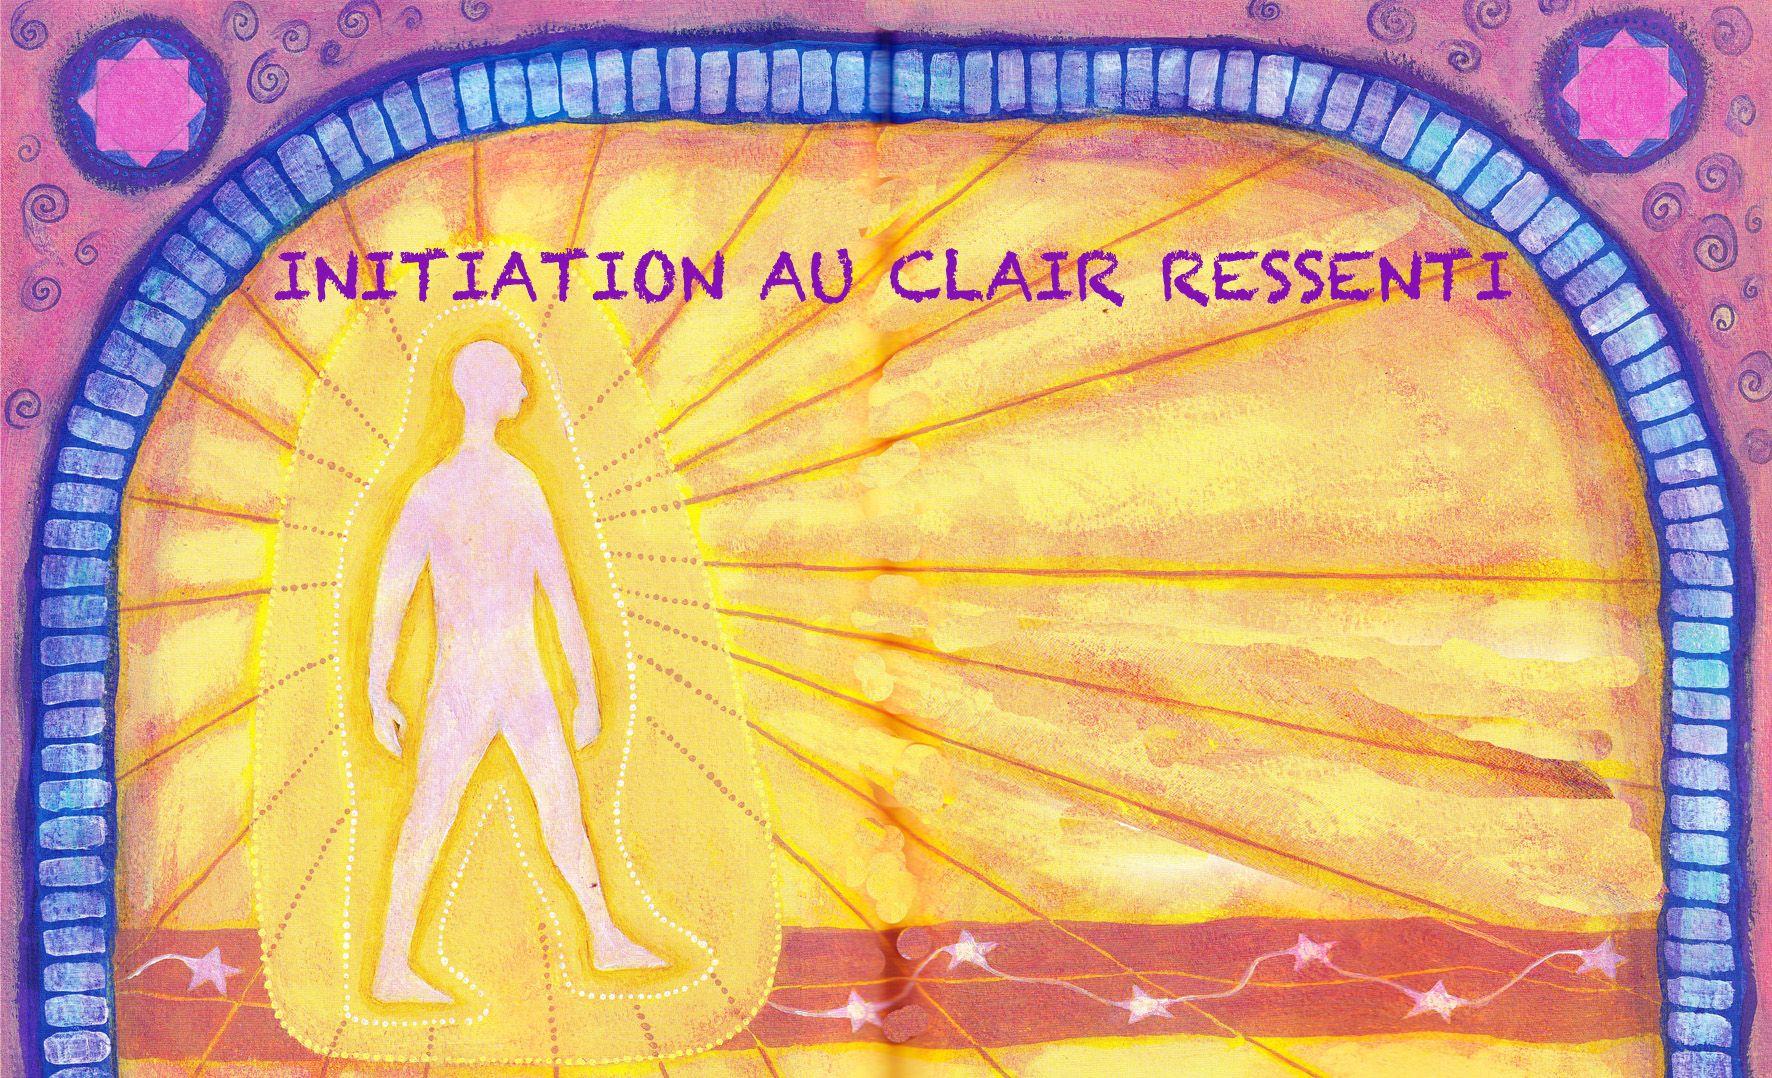 Initiation Au Clair Ressenti Methode Yann Lipnick Yann Lipnick Esprit De La Nature Geobiologie